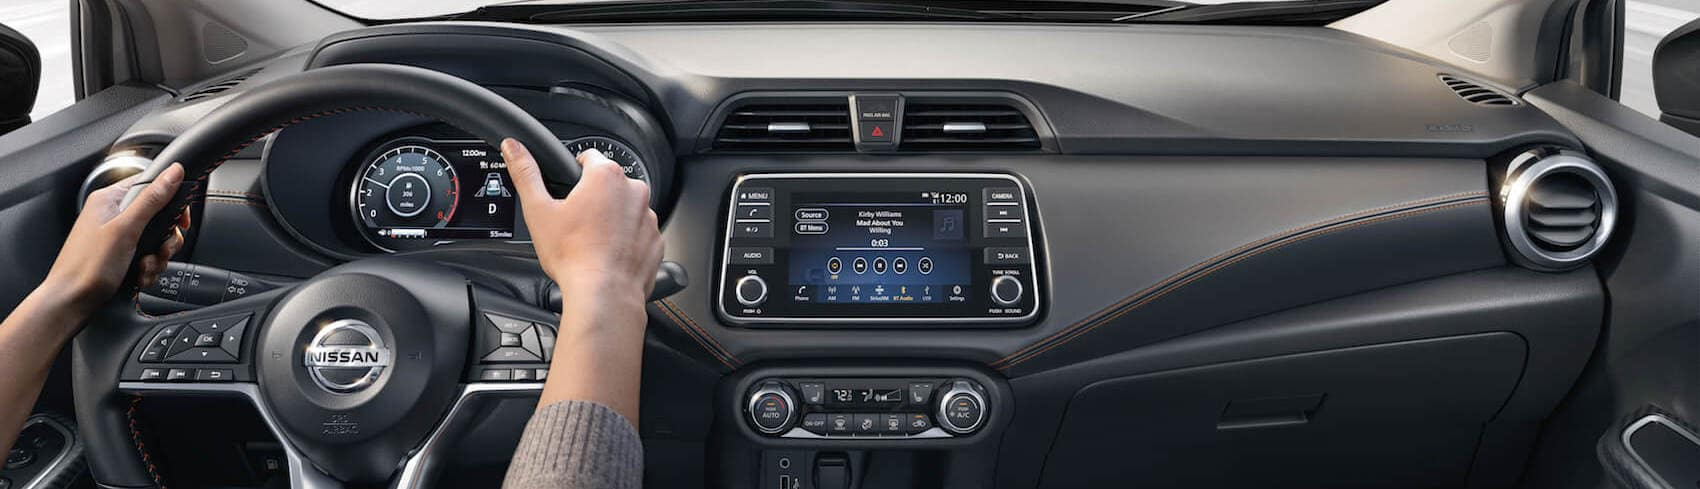 2020 Nissan Versa technology New Castle, DE